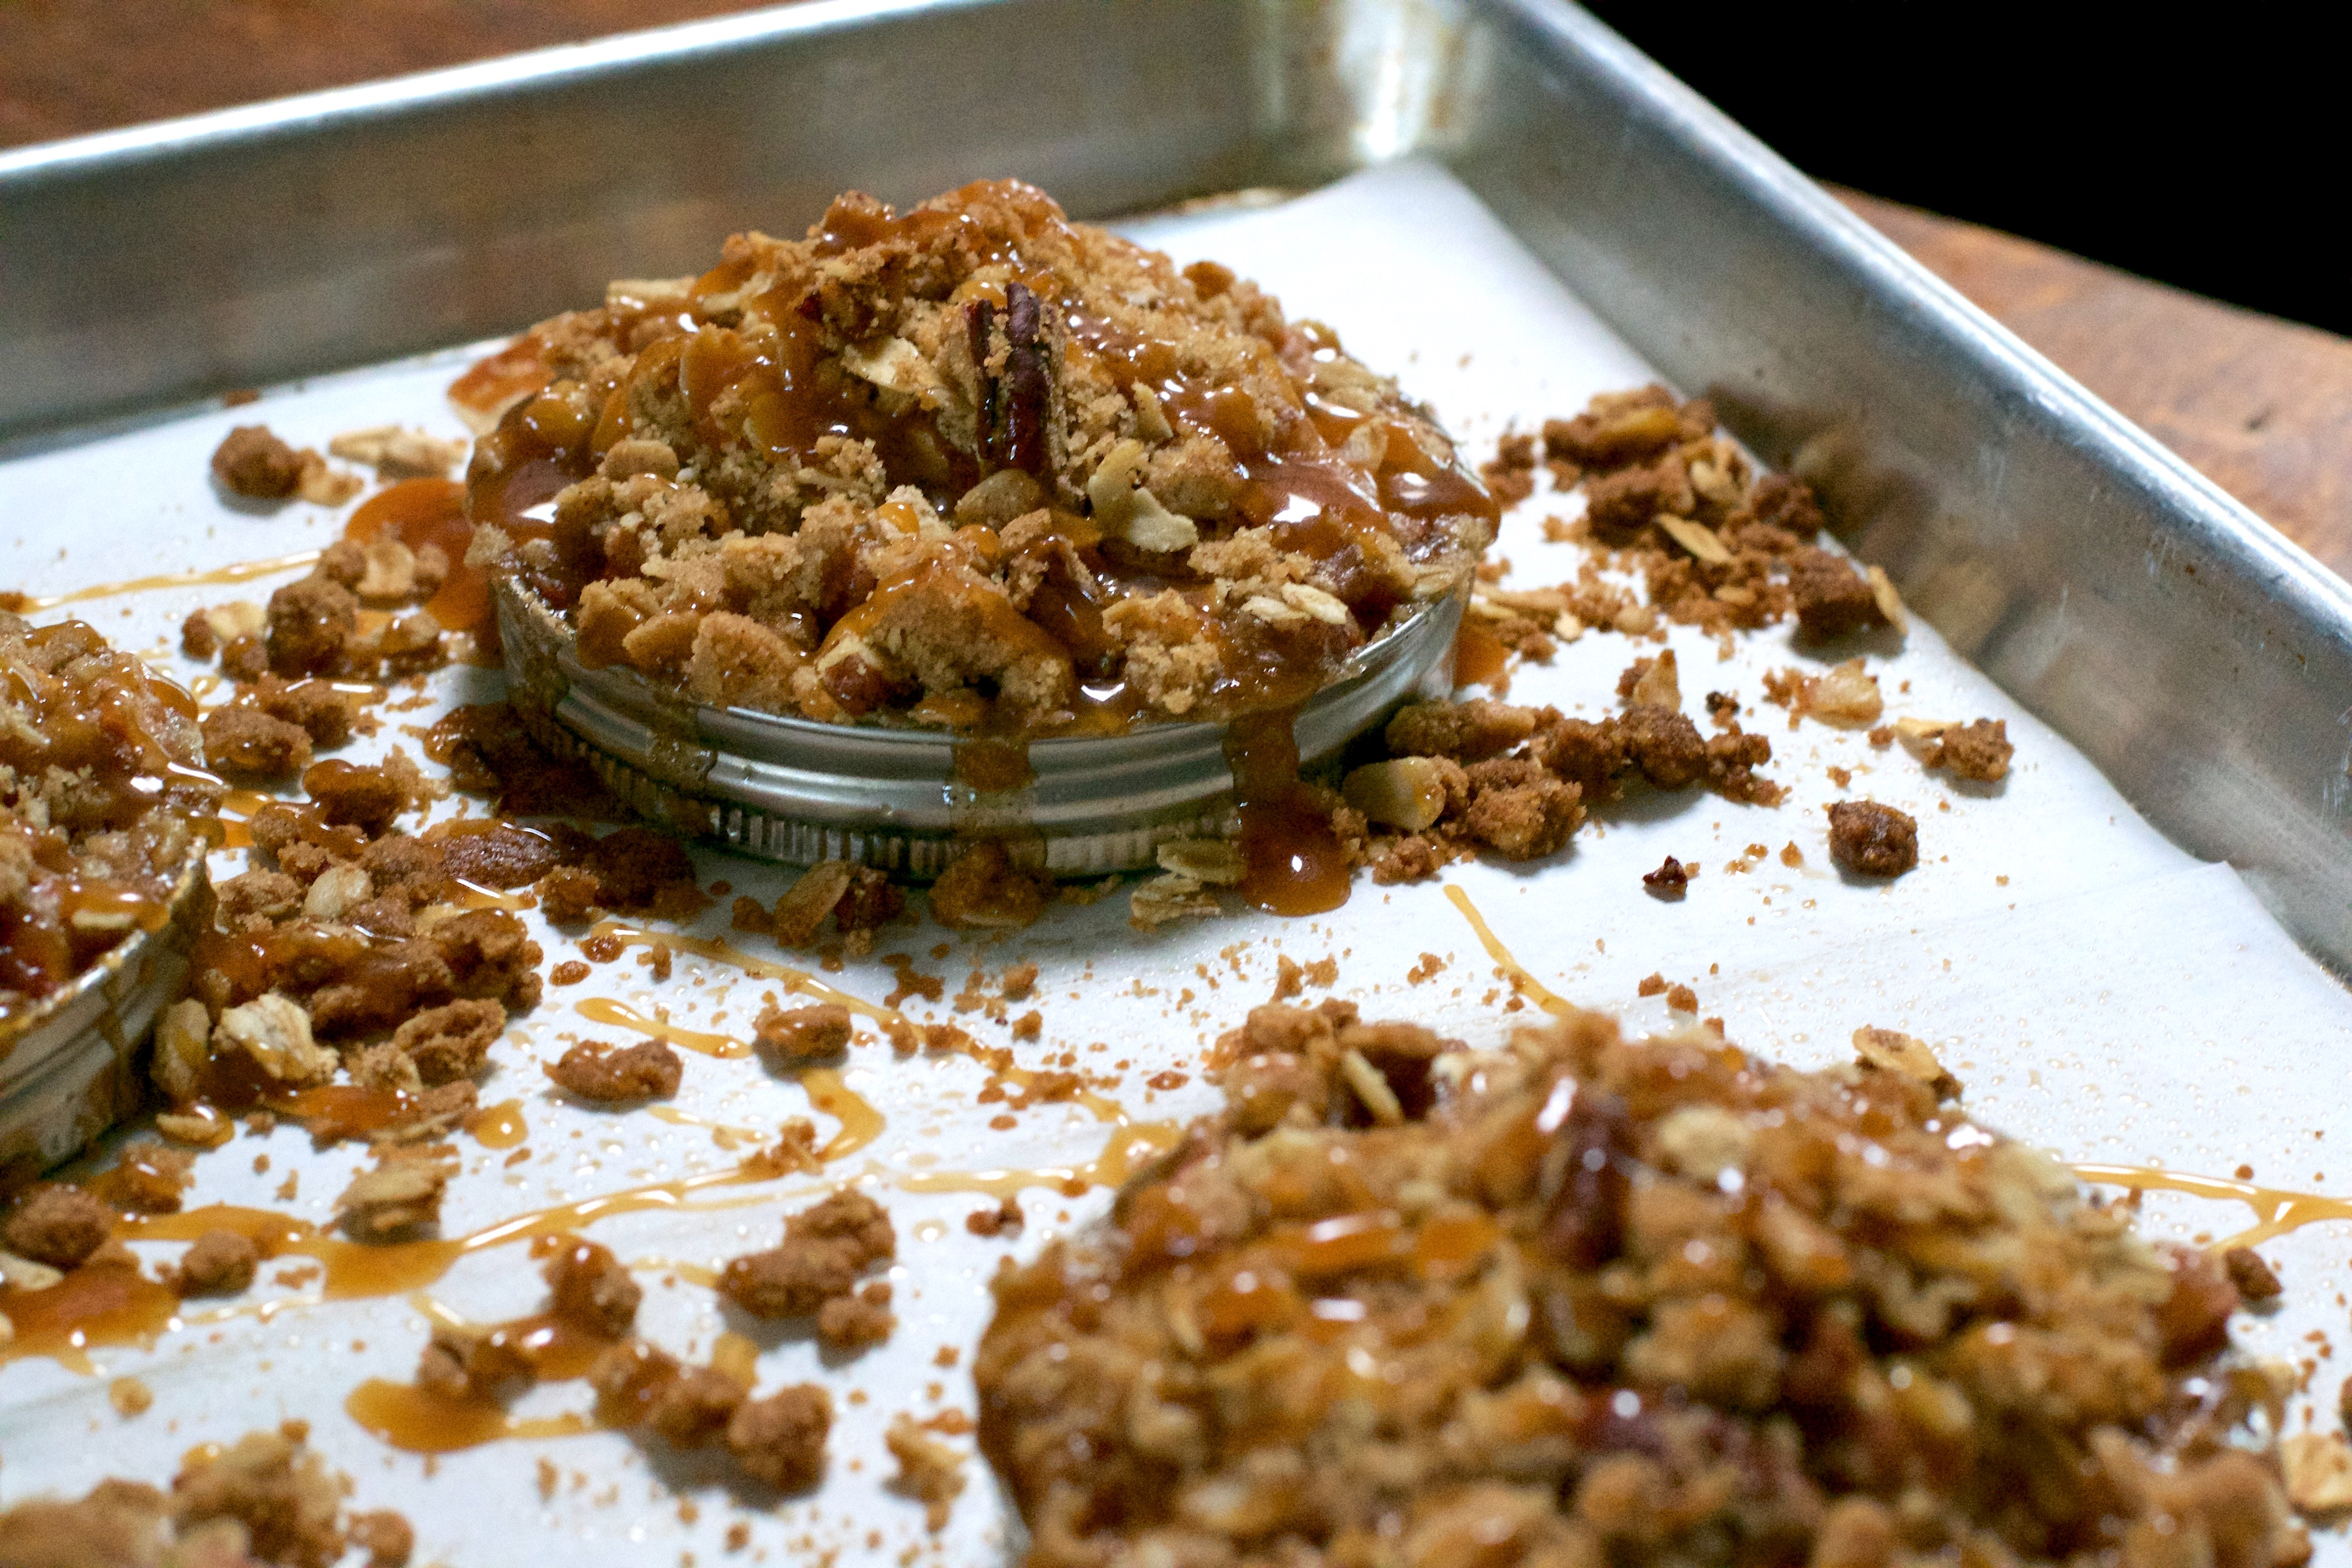 ... , but oatmeal is a key crisp ingredient. No oatmeal – not crisp